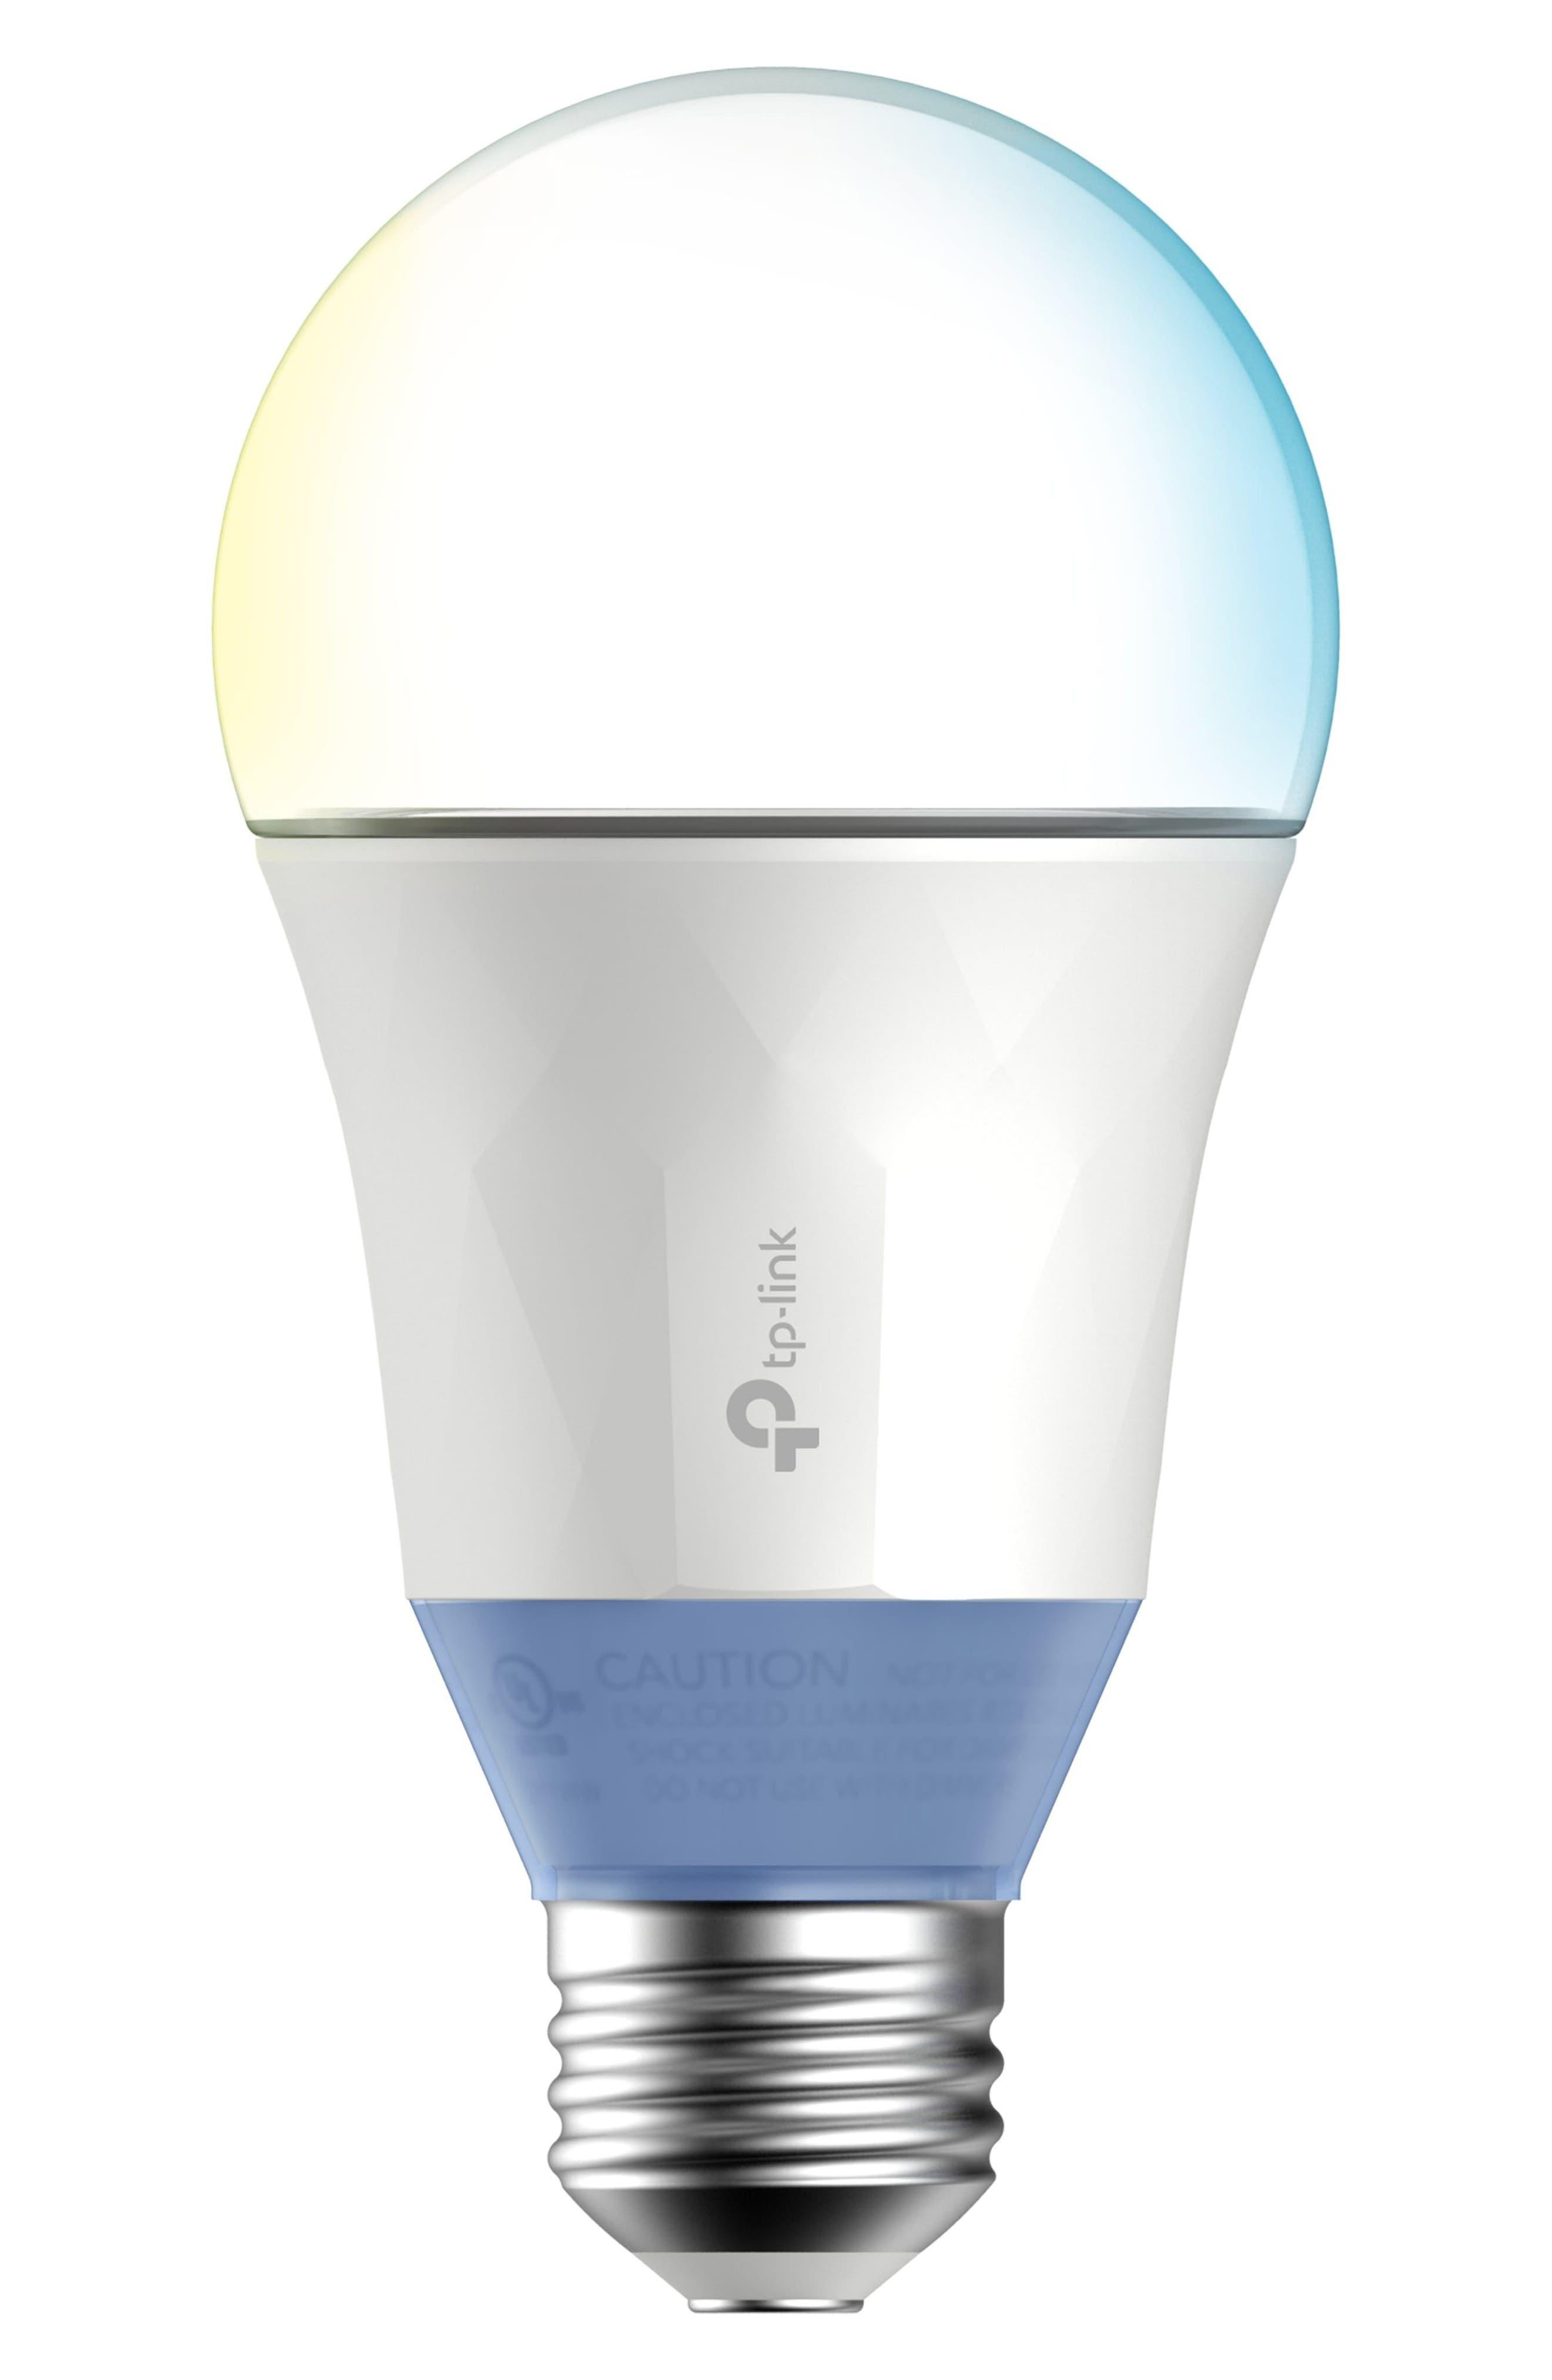 TP-Link Smart Wi-Fi Tunable LED Light Bulb